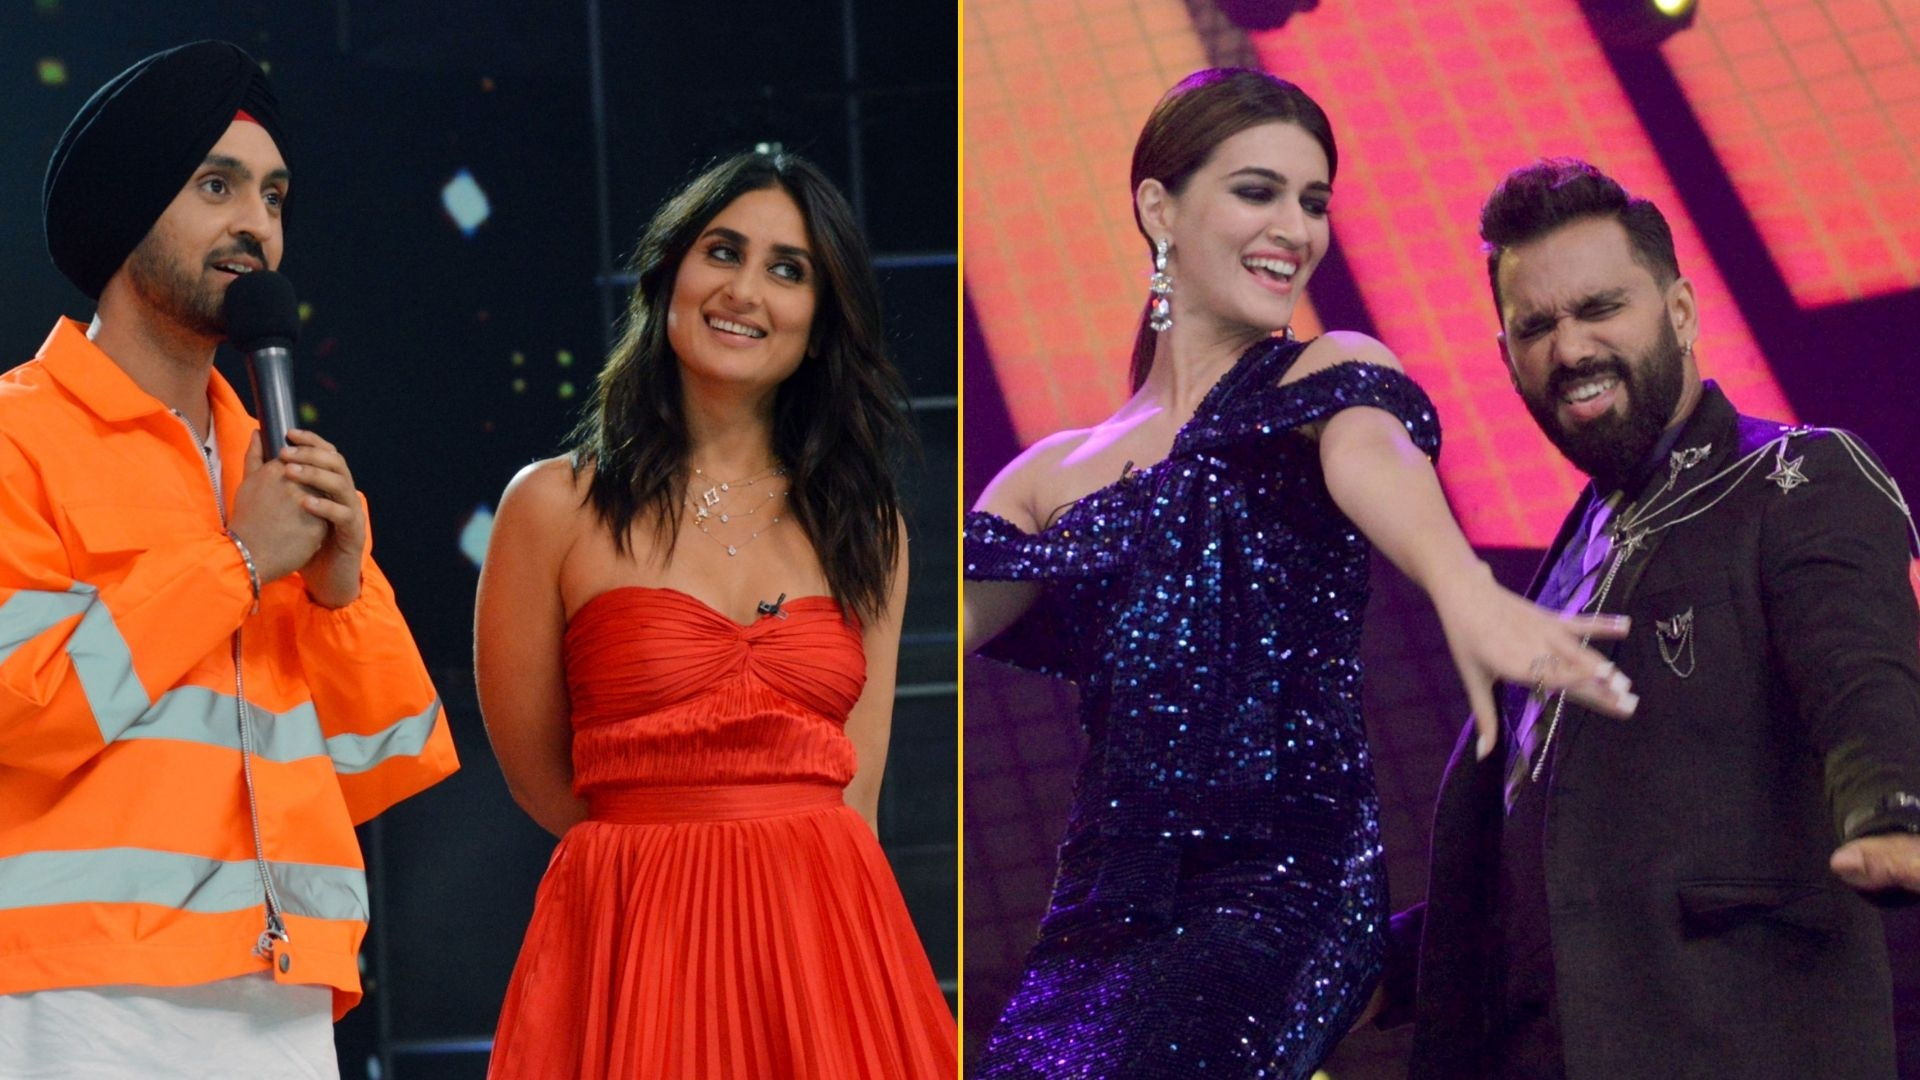 Pics: Diljit Dosanjh and Kriti Sanon Shake a Leg With Kareena